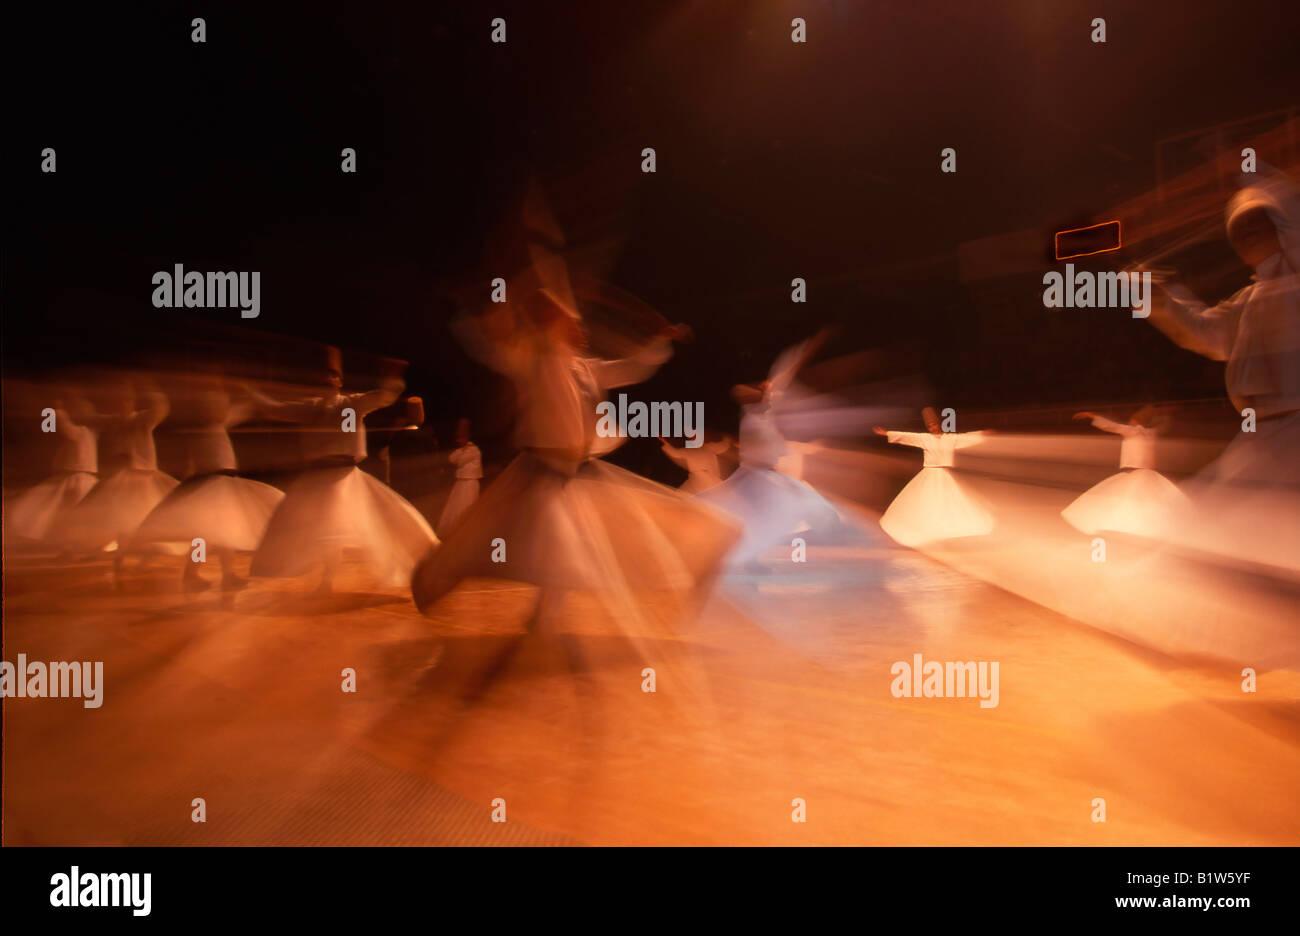 Turkey Istanbul Whirling Dervish dancers - Stock Image